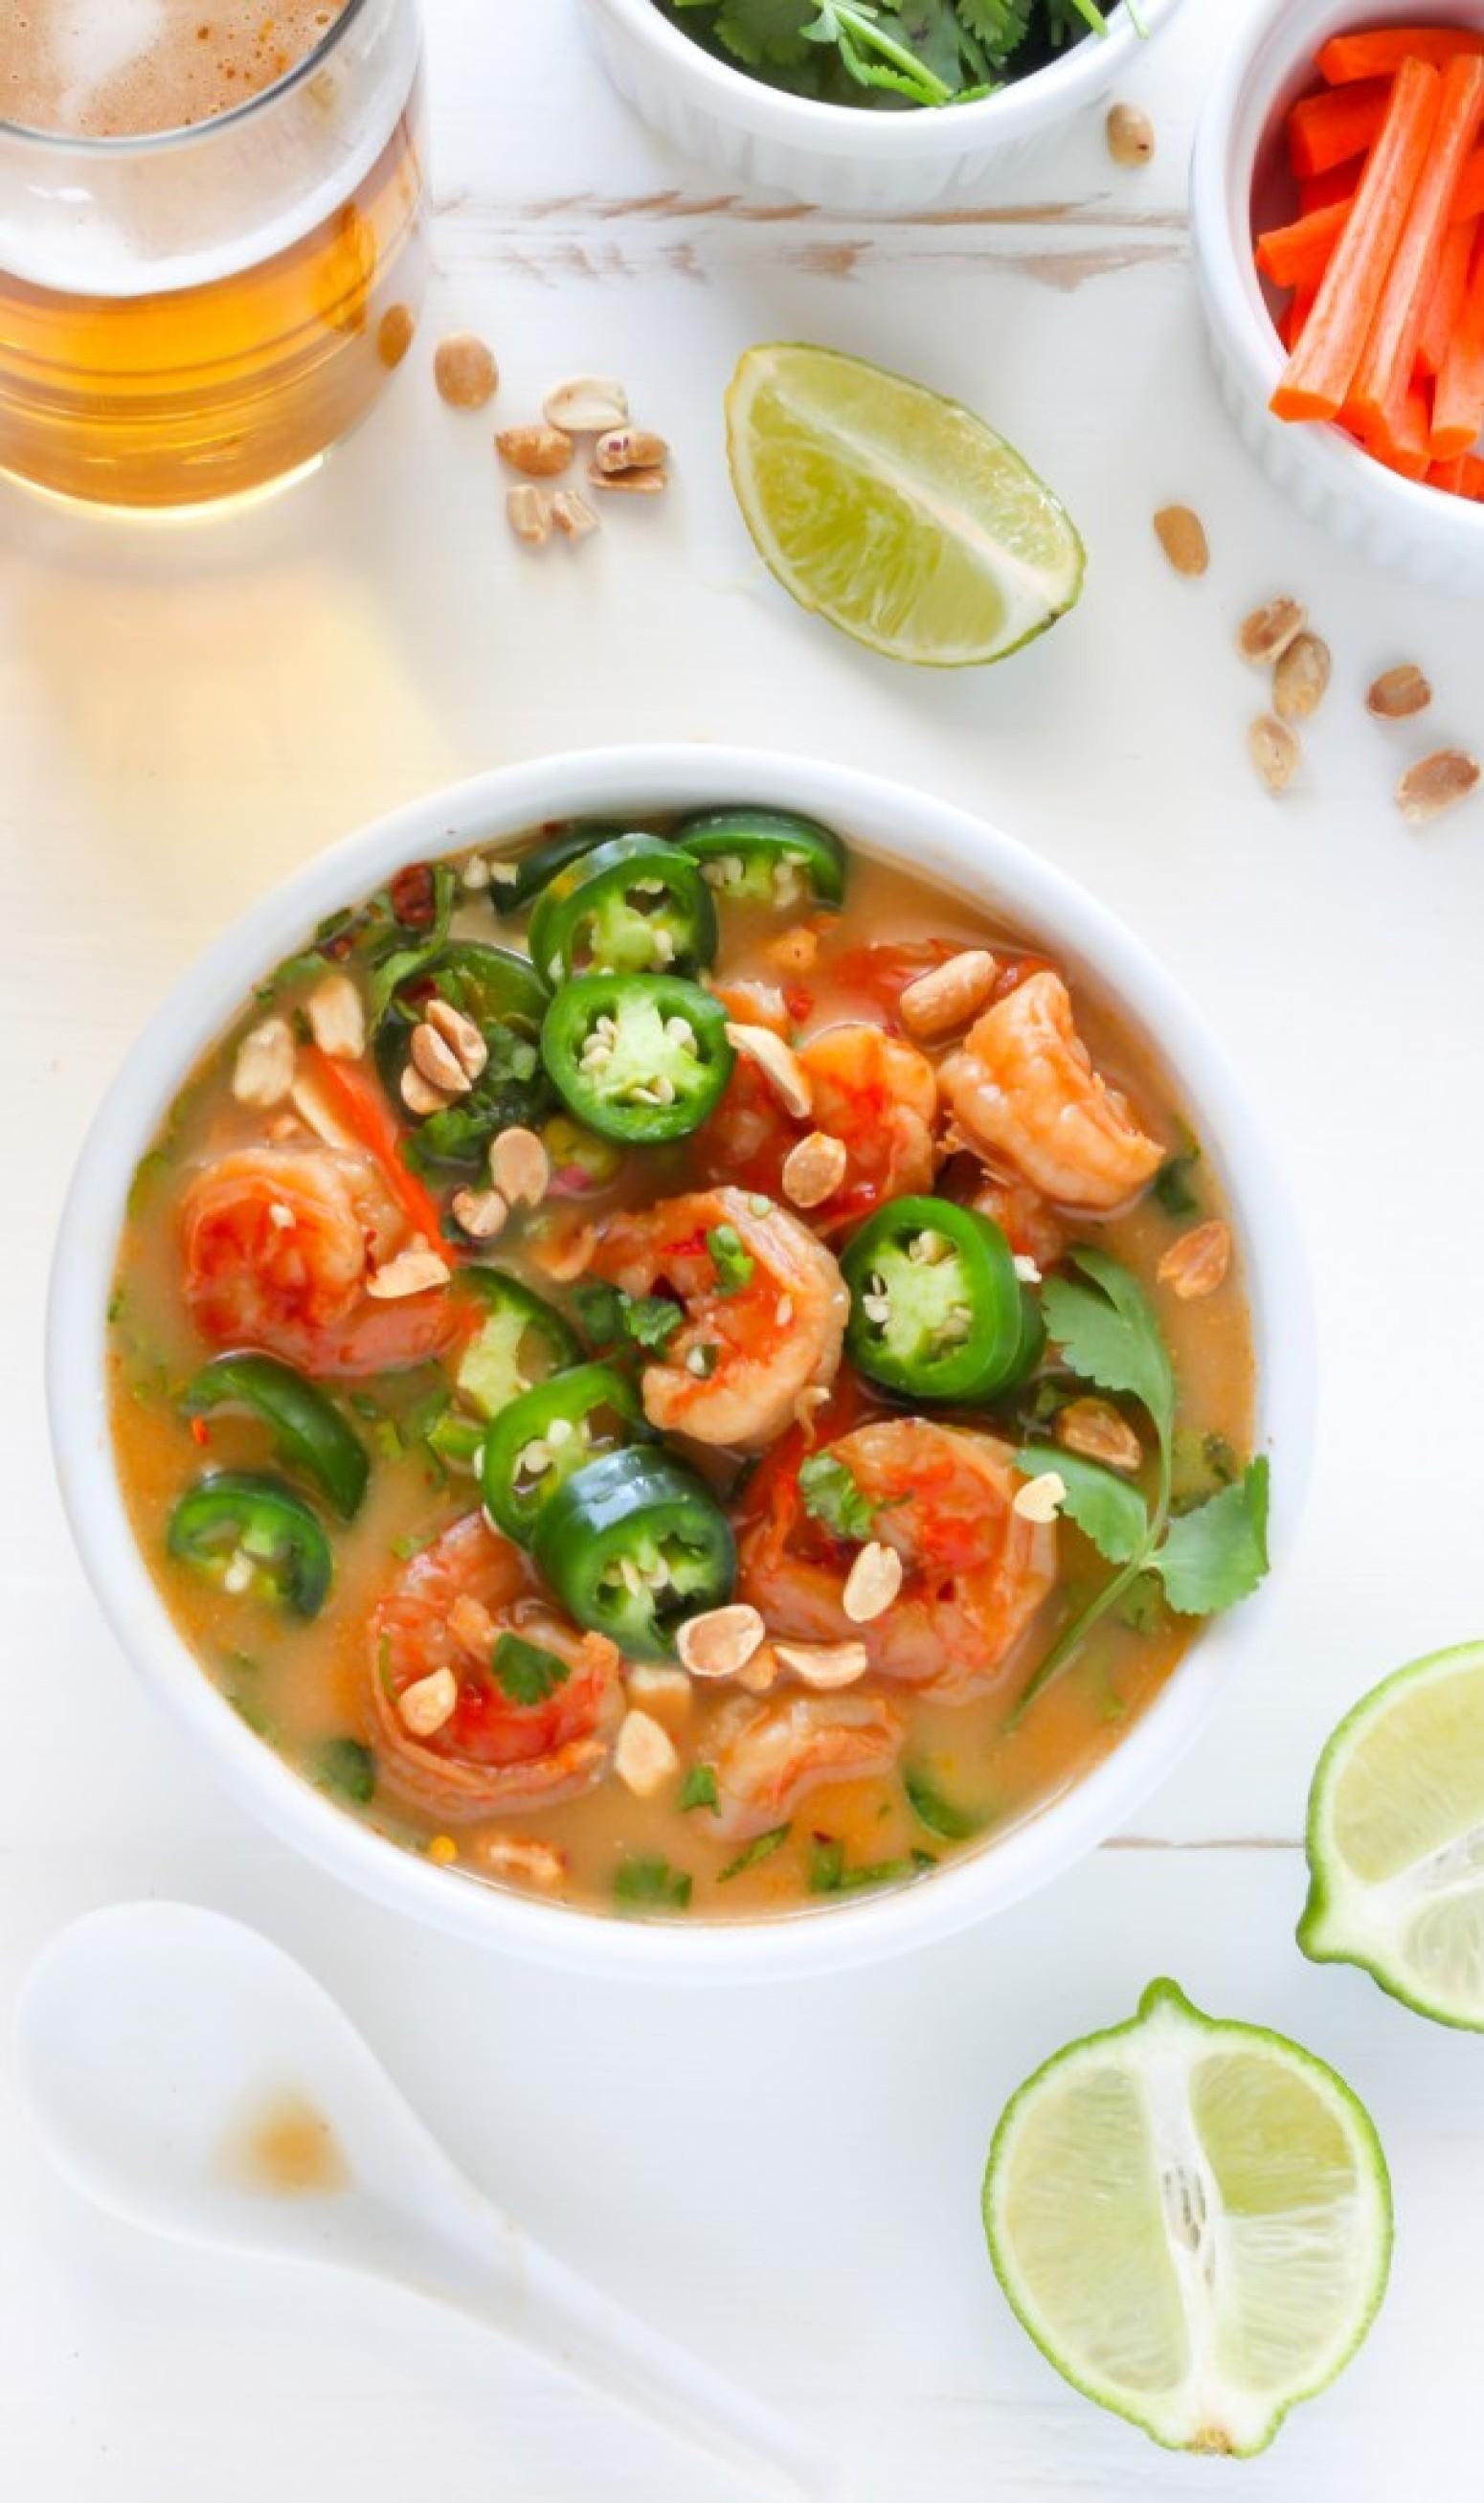 Thai Coconut Shrimp Soup Recipe 3 | Just A Pinch Recipes